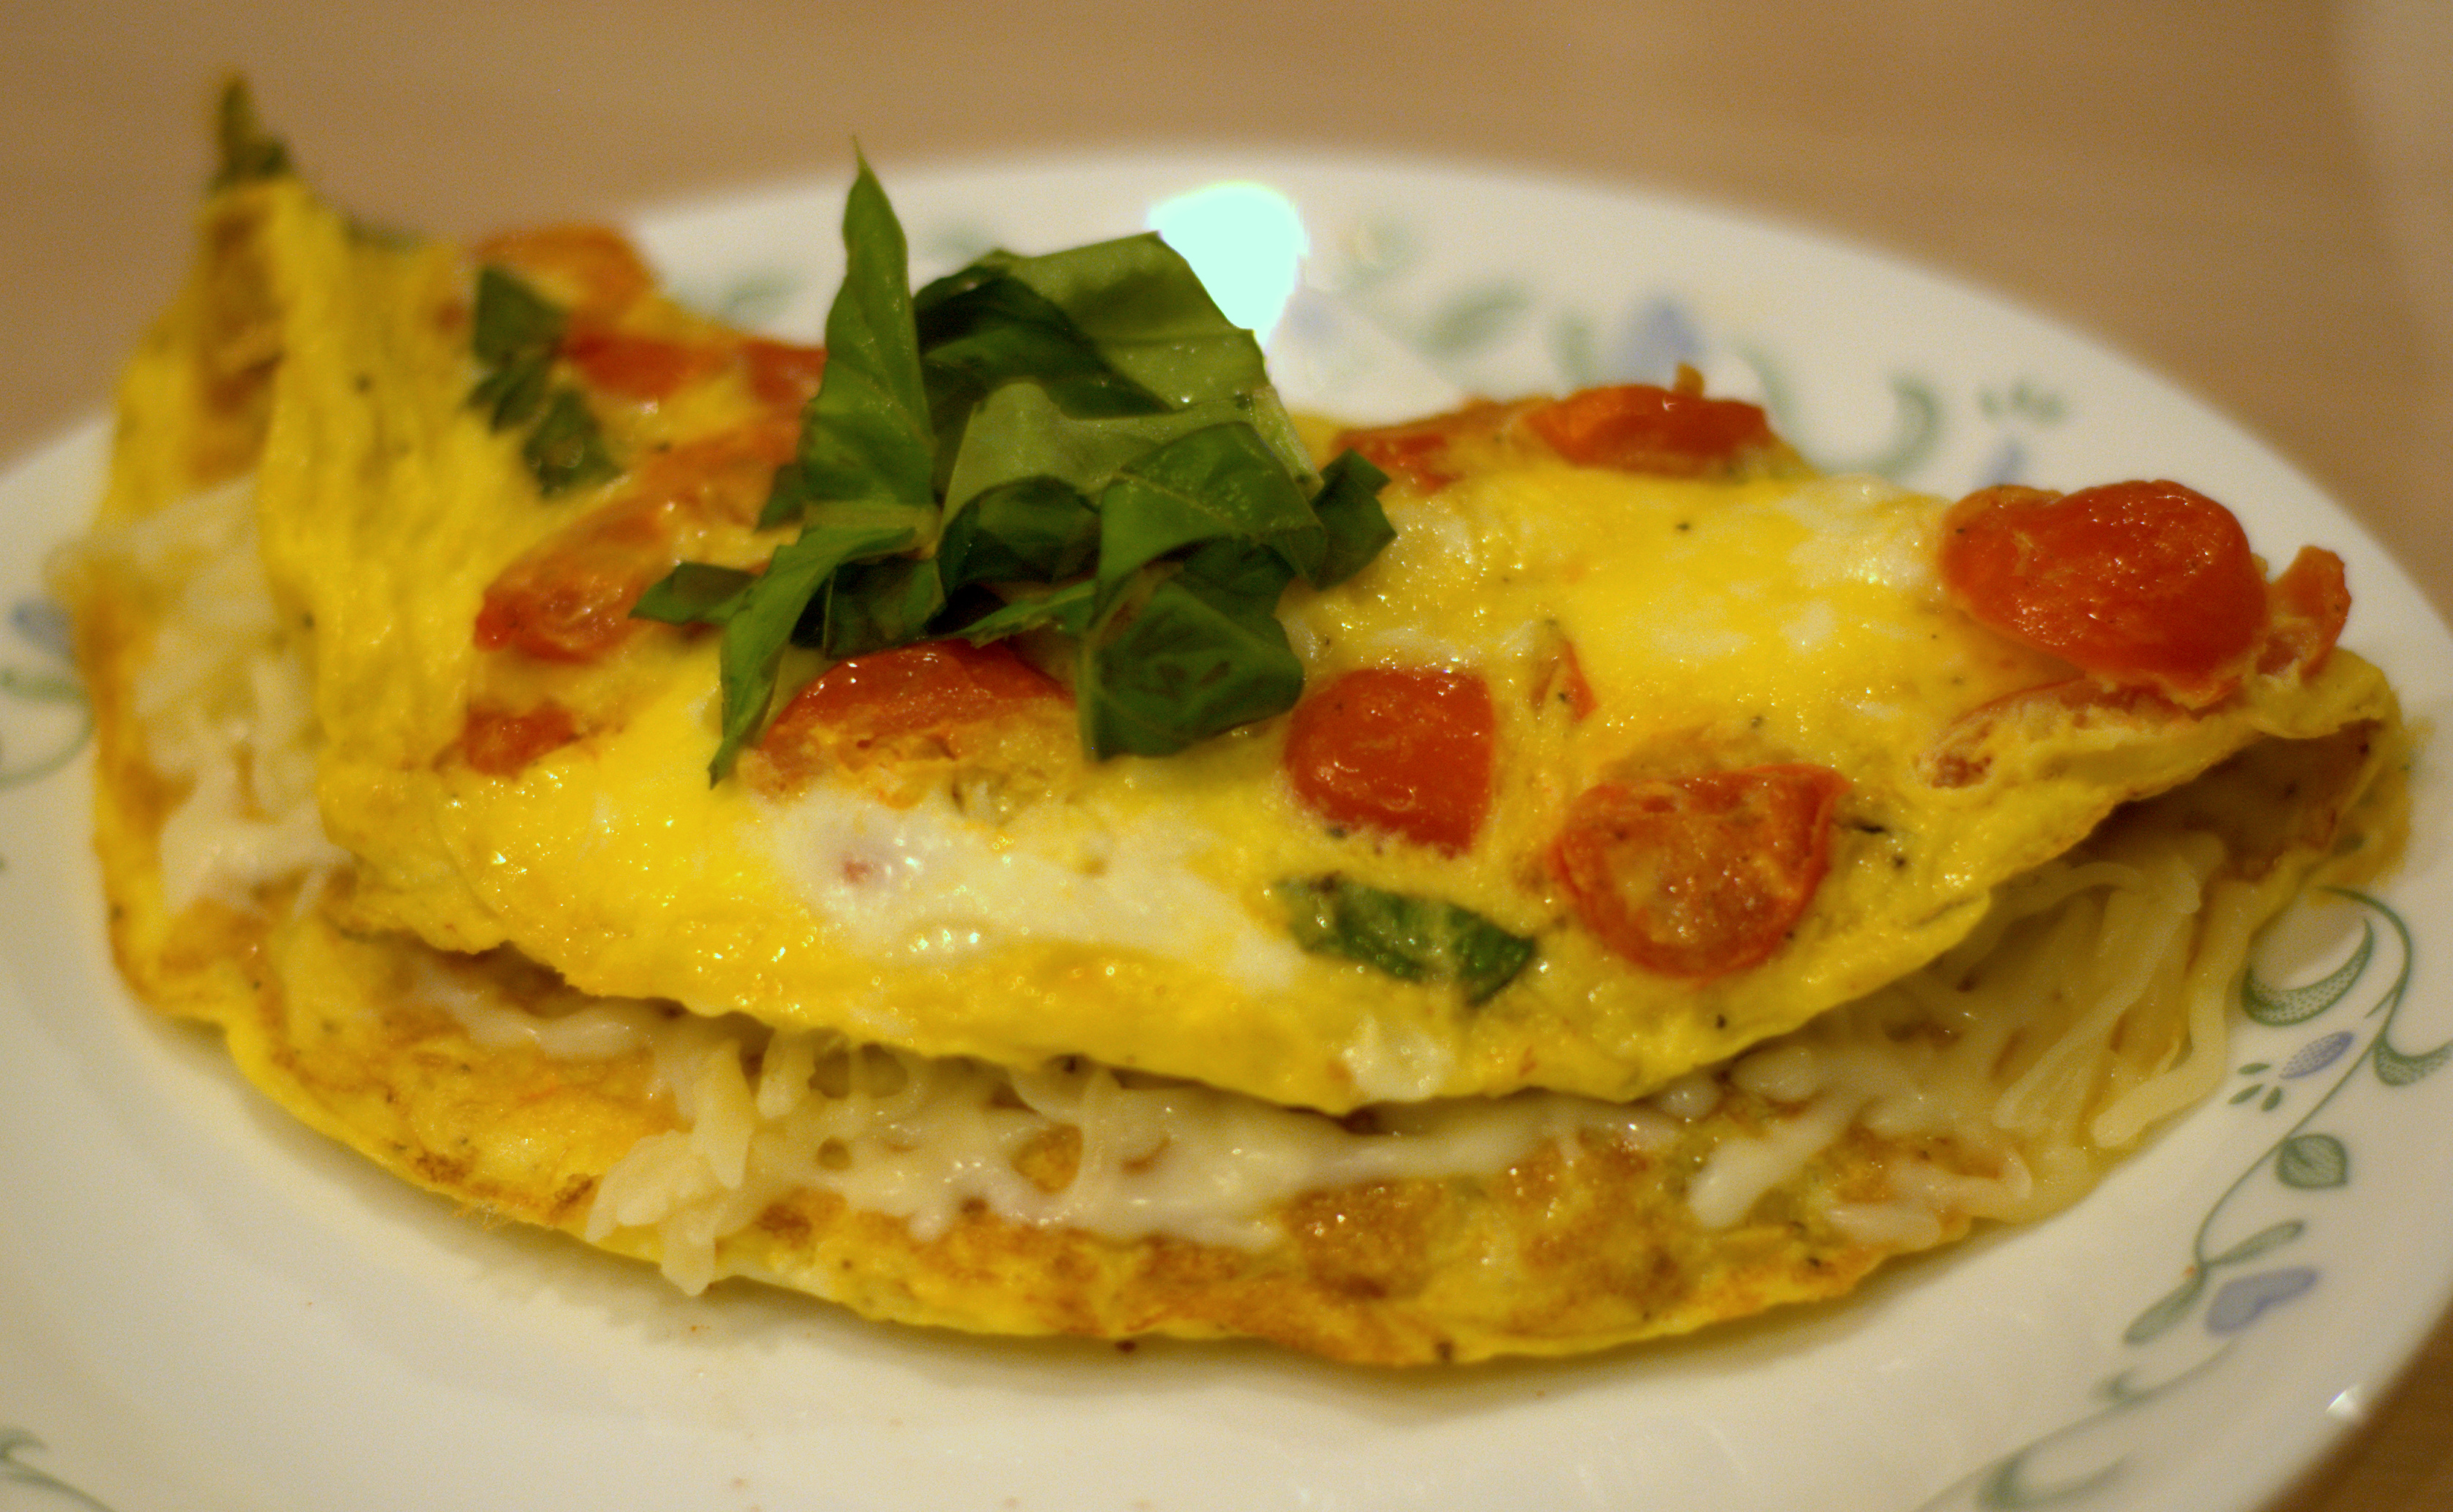 Tomato Mozzarella and Basil Omelet | Test My Recipes